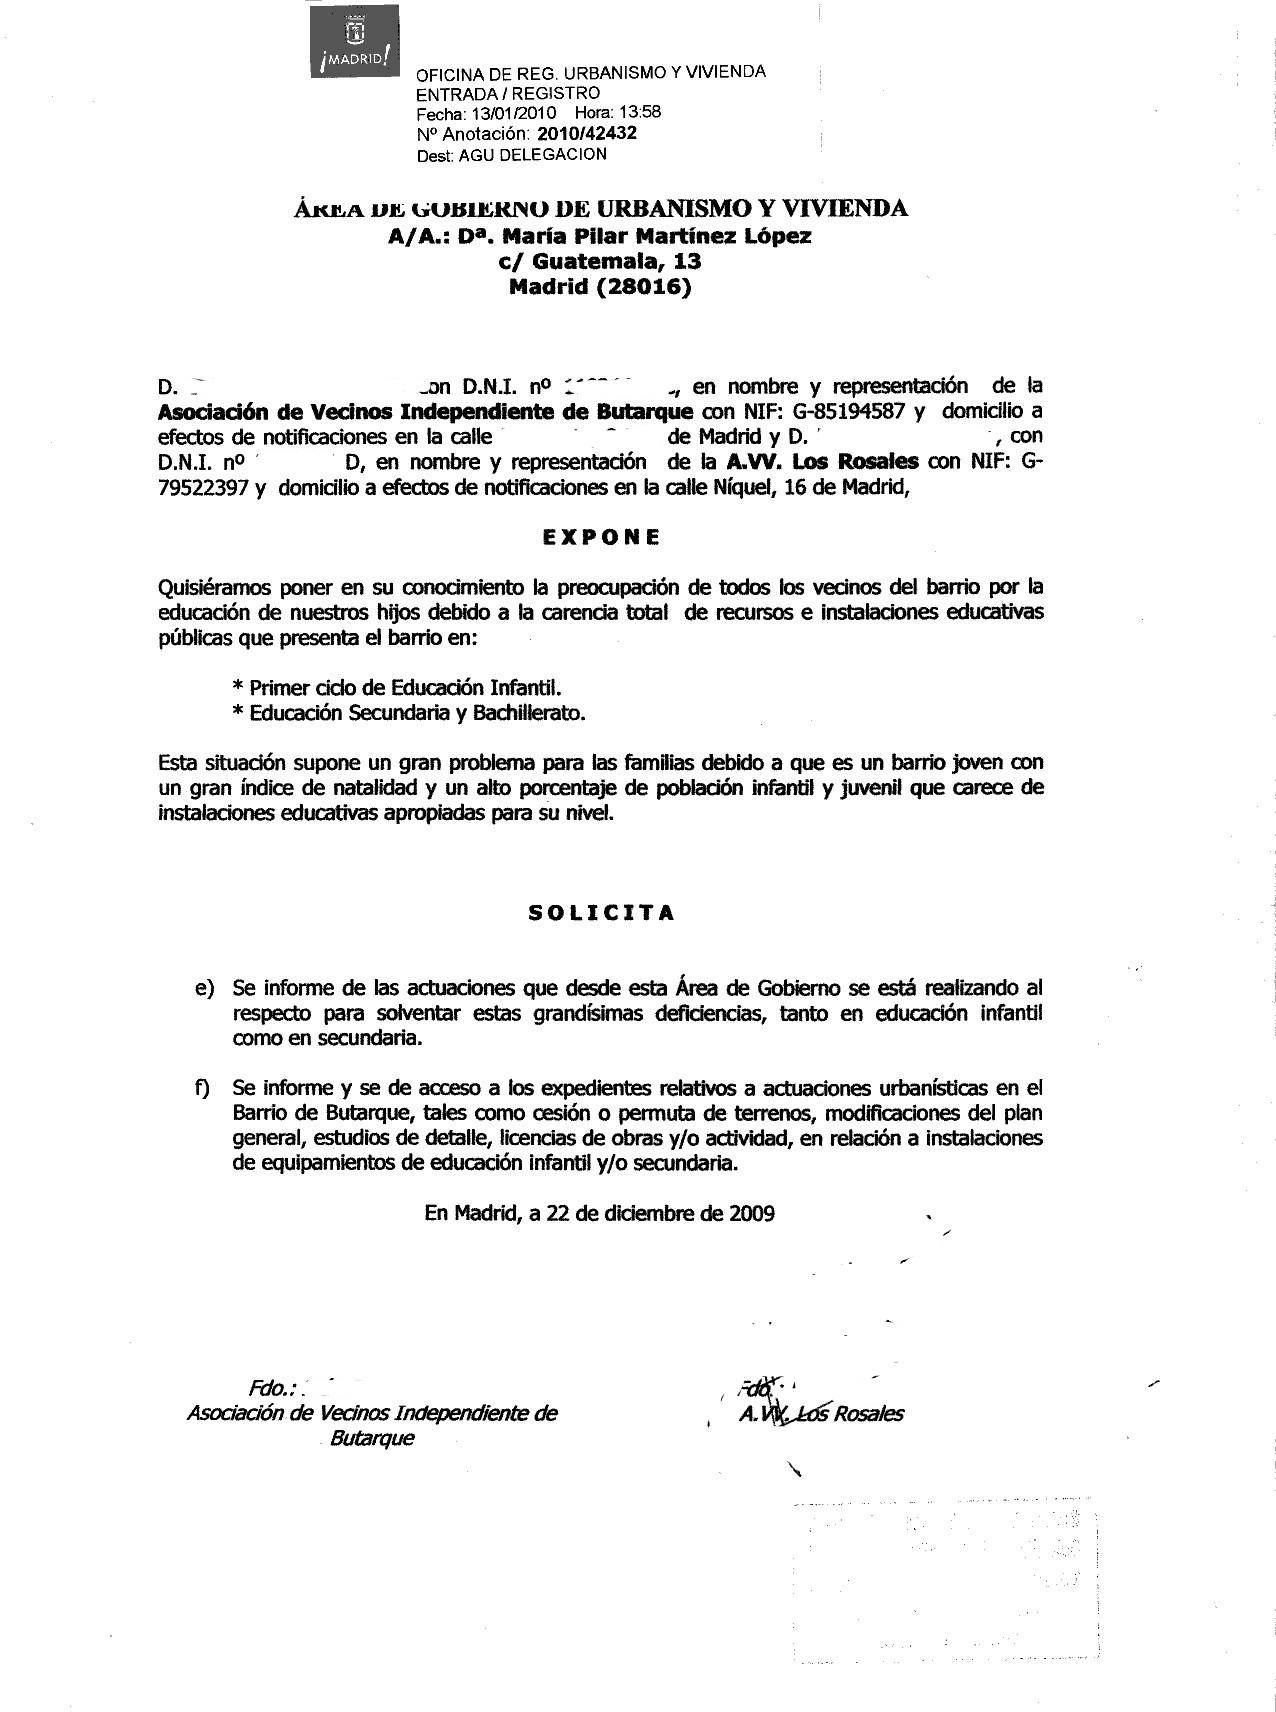 Educacion_Area_Urbanismo_y_Vivienda.jpg